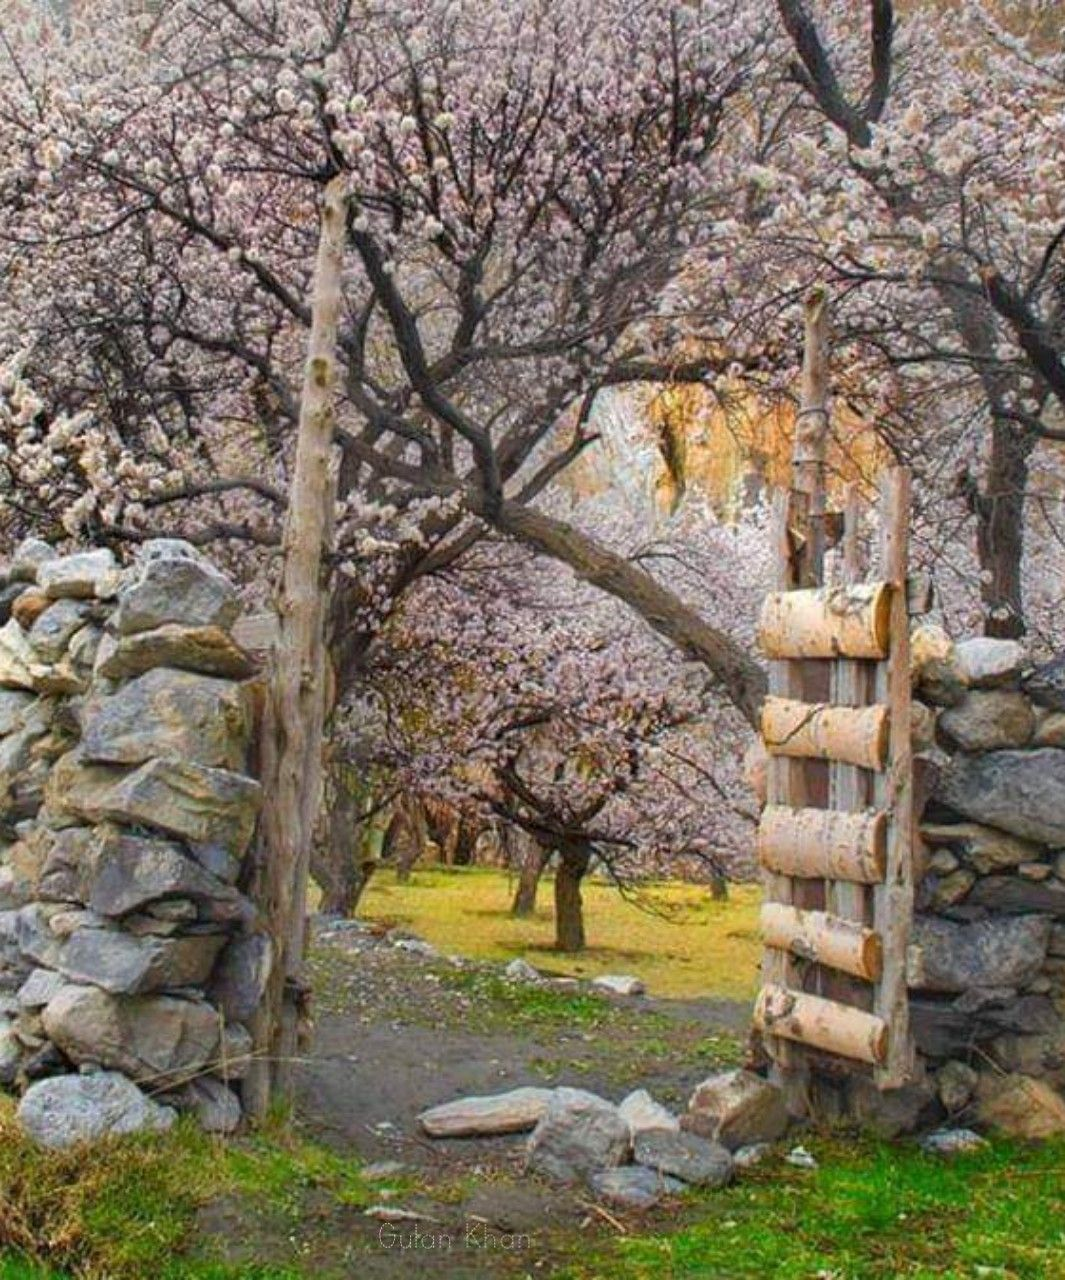 Pakistan Very Nice Captured The Beauty Of Hunza Valley Fantastic Cherry Blossom Trees At Gilgit Baltistan Pakistan M Blossom Trees Cherry Blossom Tree Tree